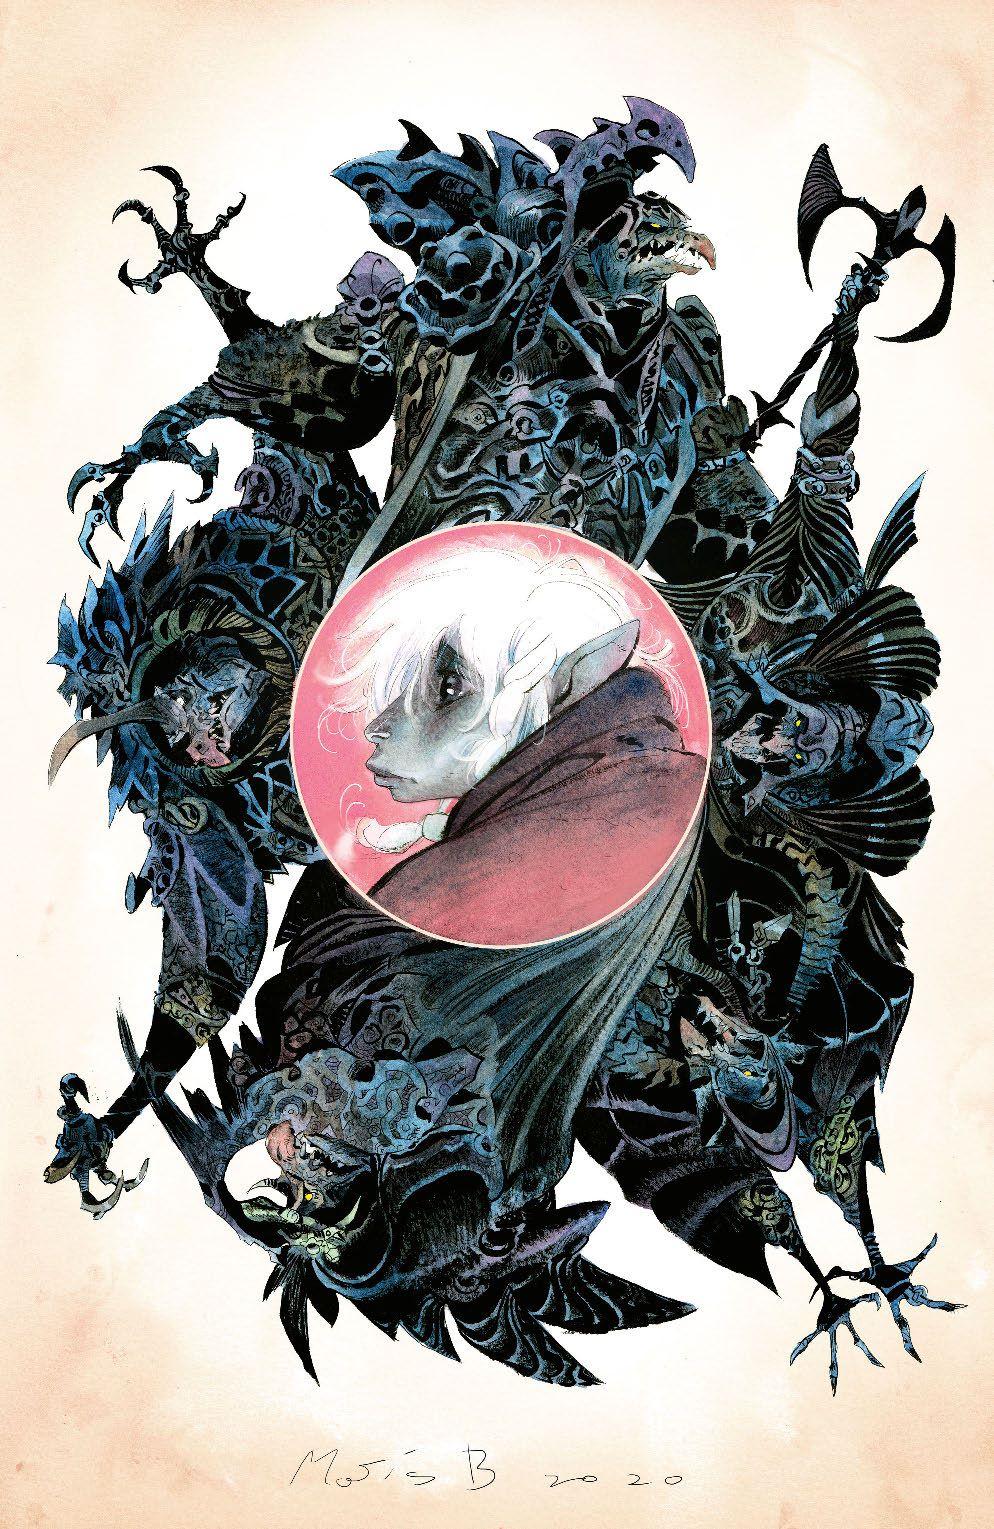 DarkCrystal_AgeResistance_011_Cover_UnlockedRetailer ComicList Previews: JIM HENSON'S THE DARK CRYSTAL AGE OF RESISTANCE #11